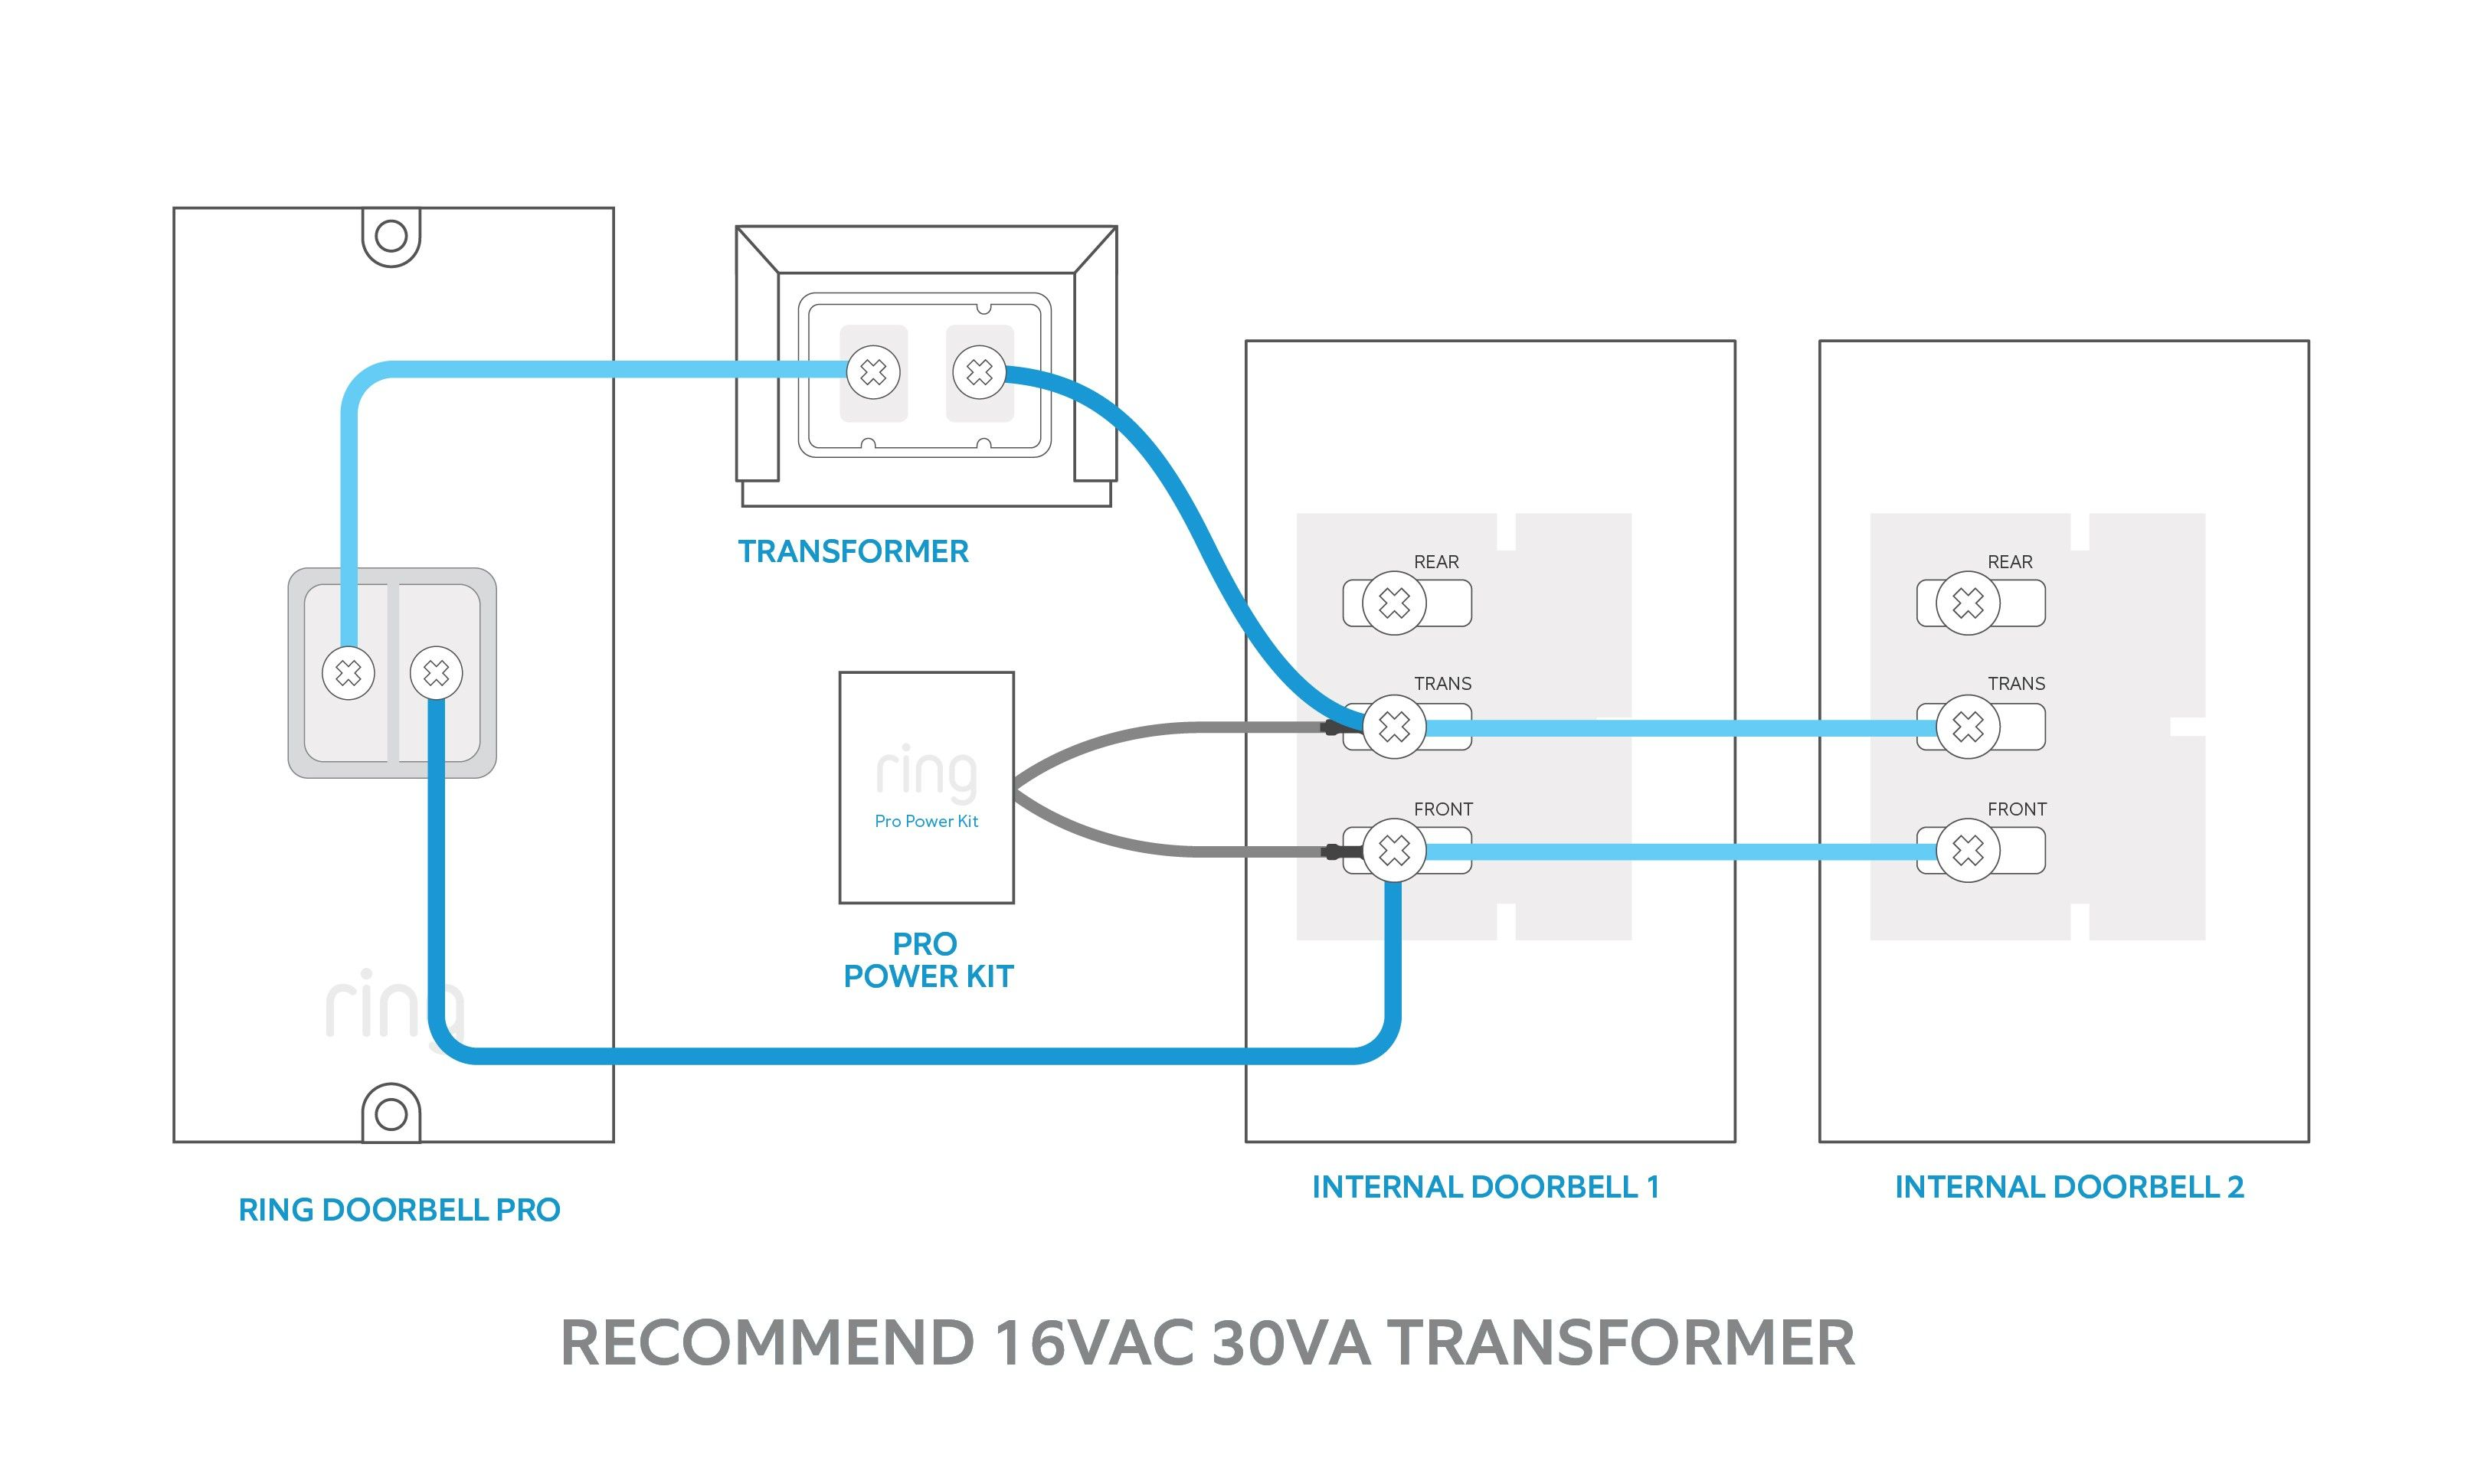 New Doorbell Wiring Diagram Tutorial Diagram Diagramsample Diagramtemplate Wiringdiagram Diagramchart Worksheet Worksh Diagram Auto Transformer Doorbell